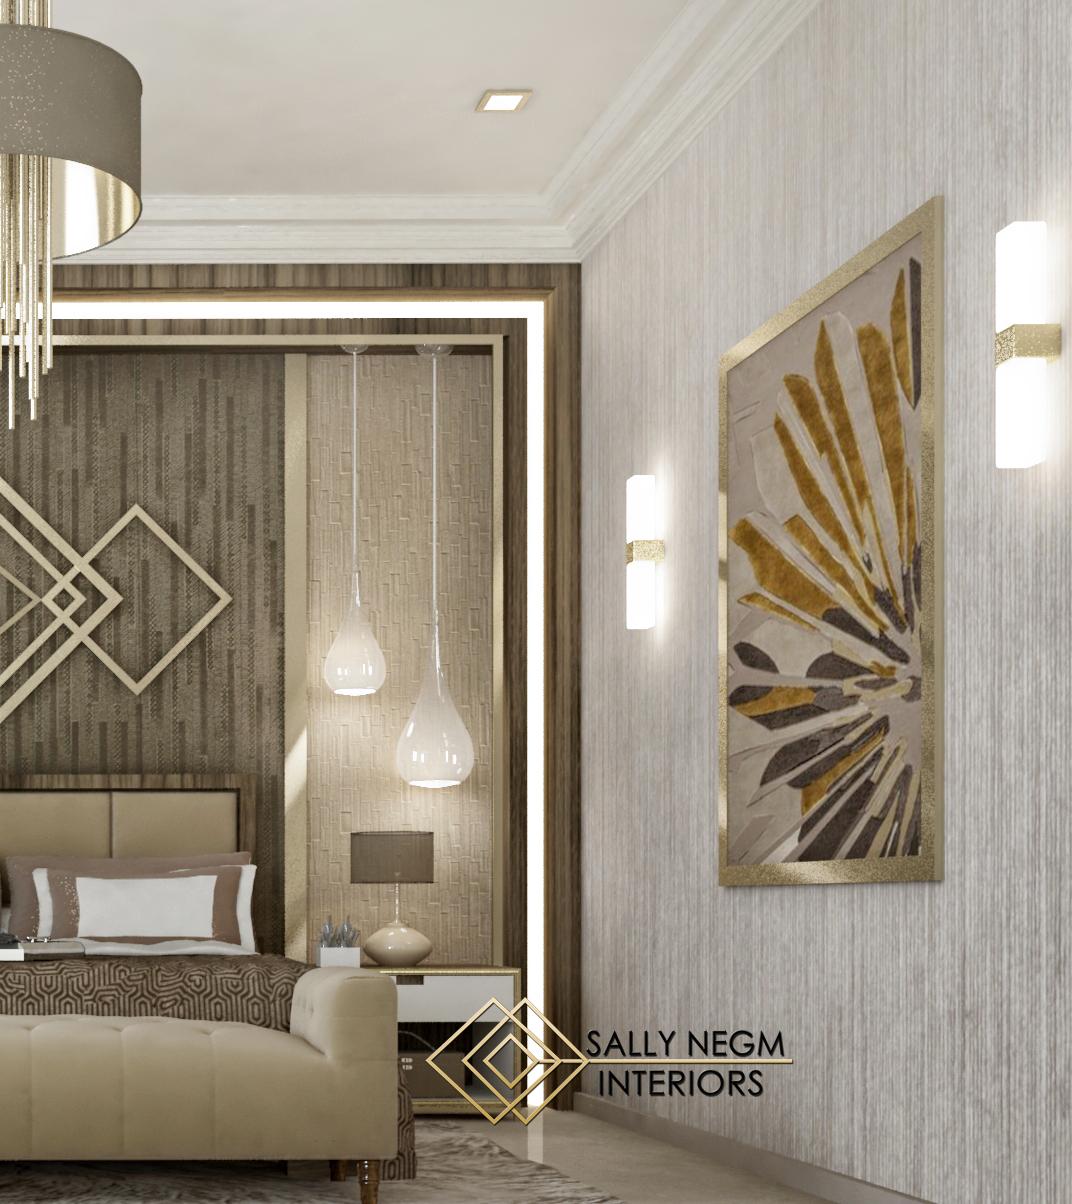 Luxury Master Bedroom Dubai On Behance: Modern Master Bedroom Interior Design #modern #luxury On